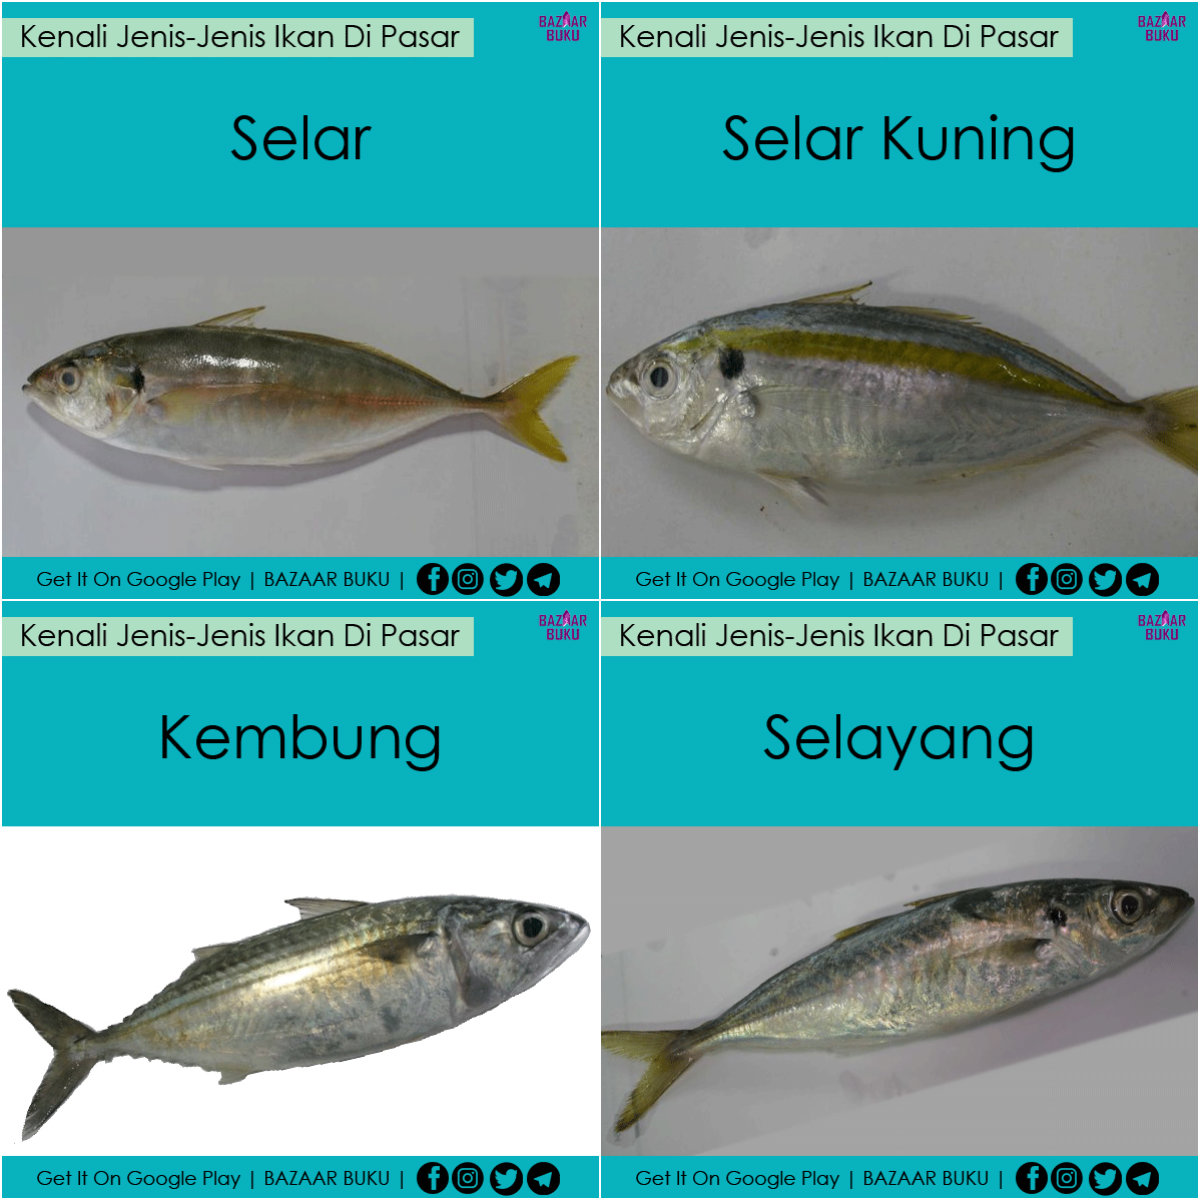 Jenis Jenis Ikan Di Pasar Aneka Ikan Hias